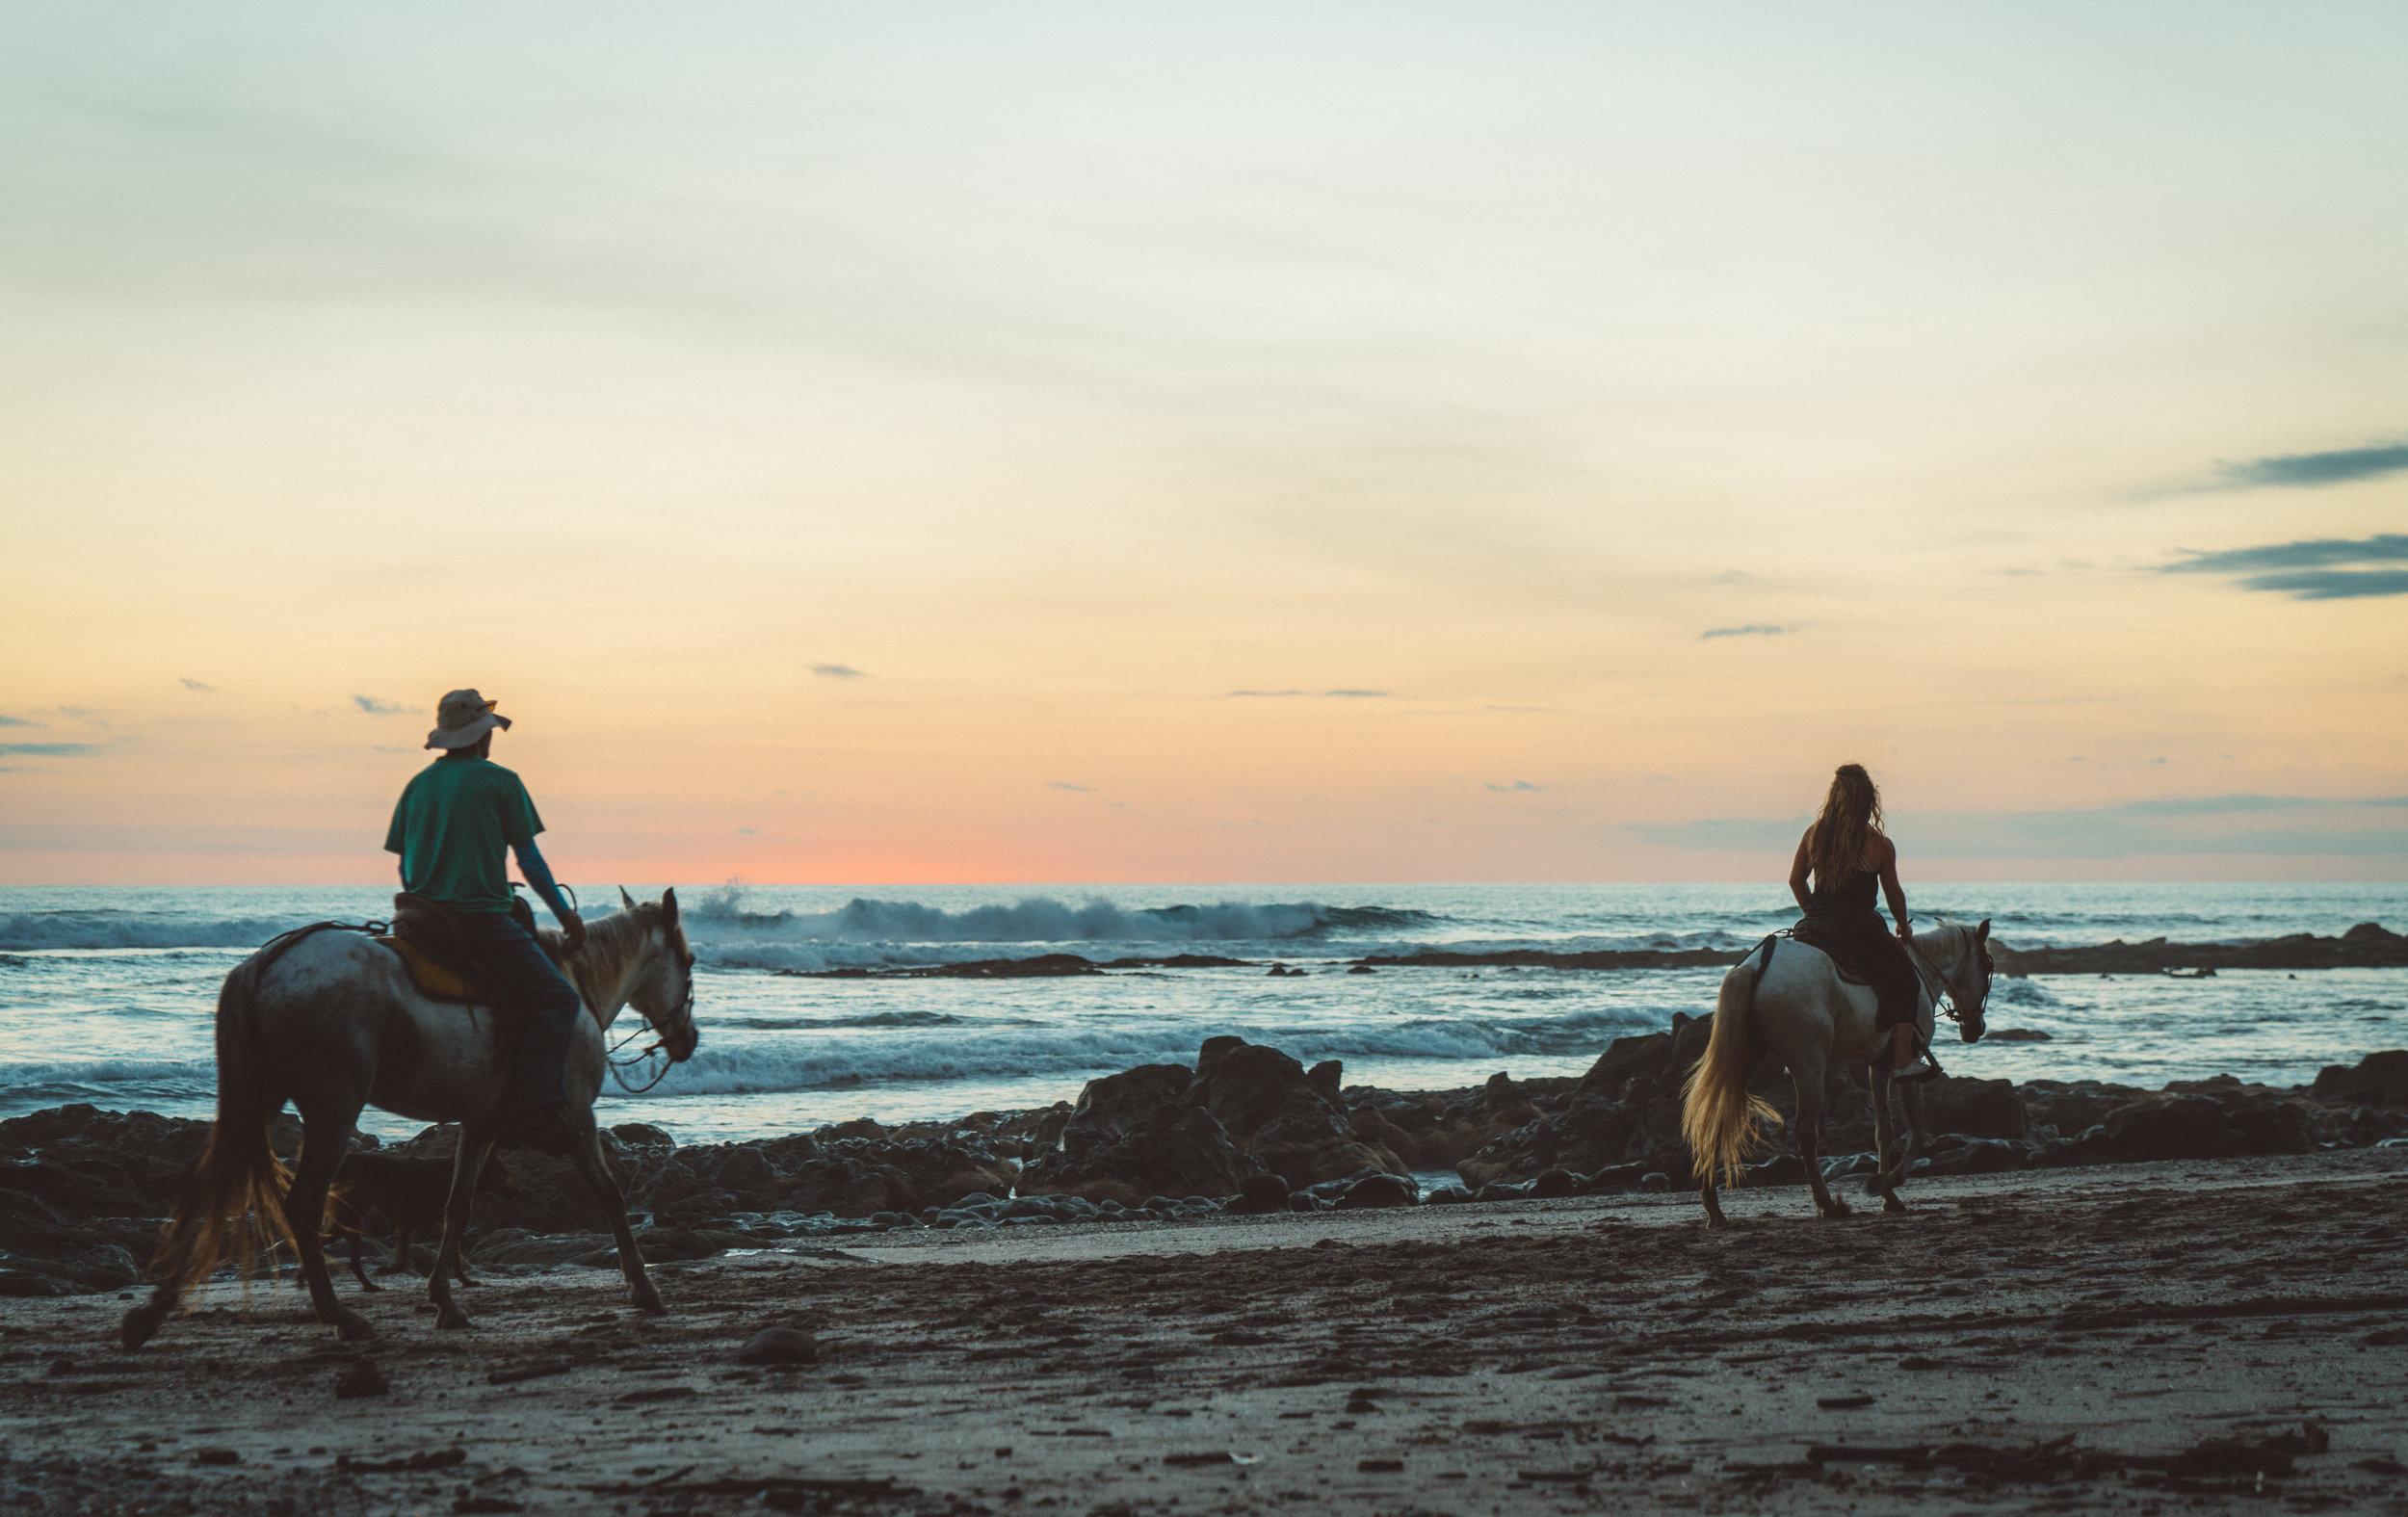 Sunset on the beach in Santa Teresa.